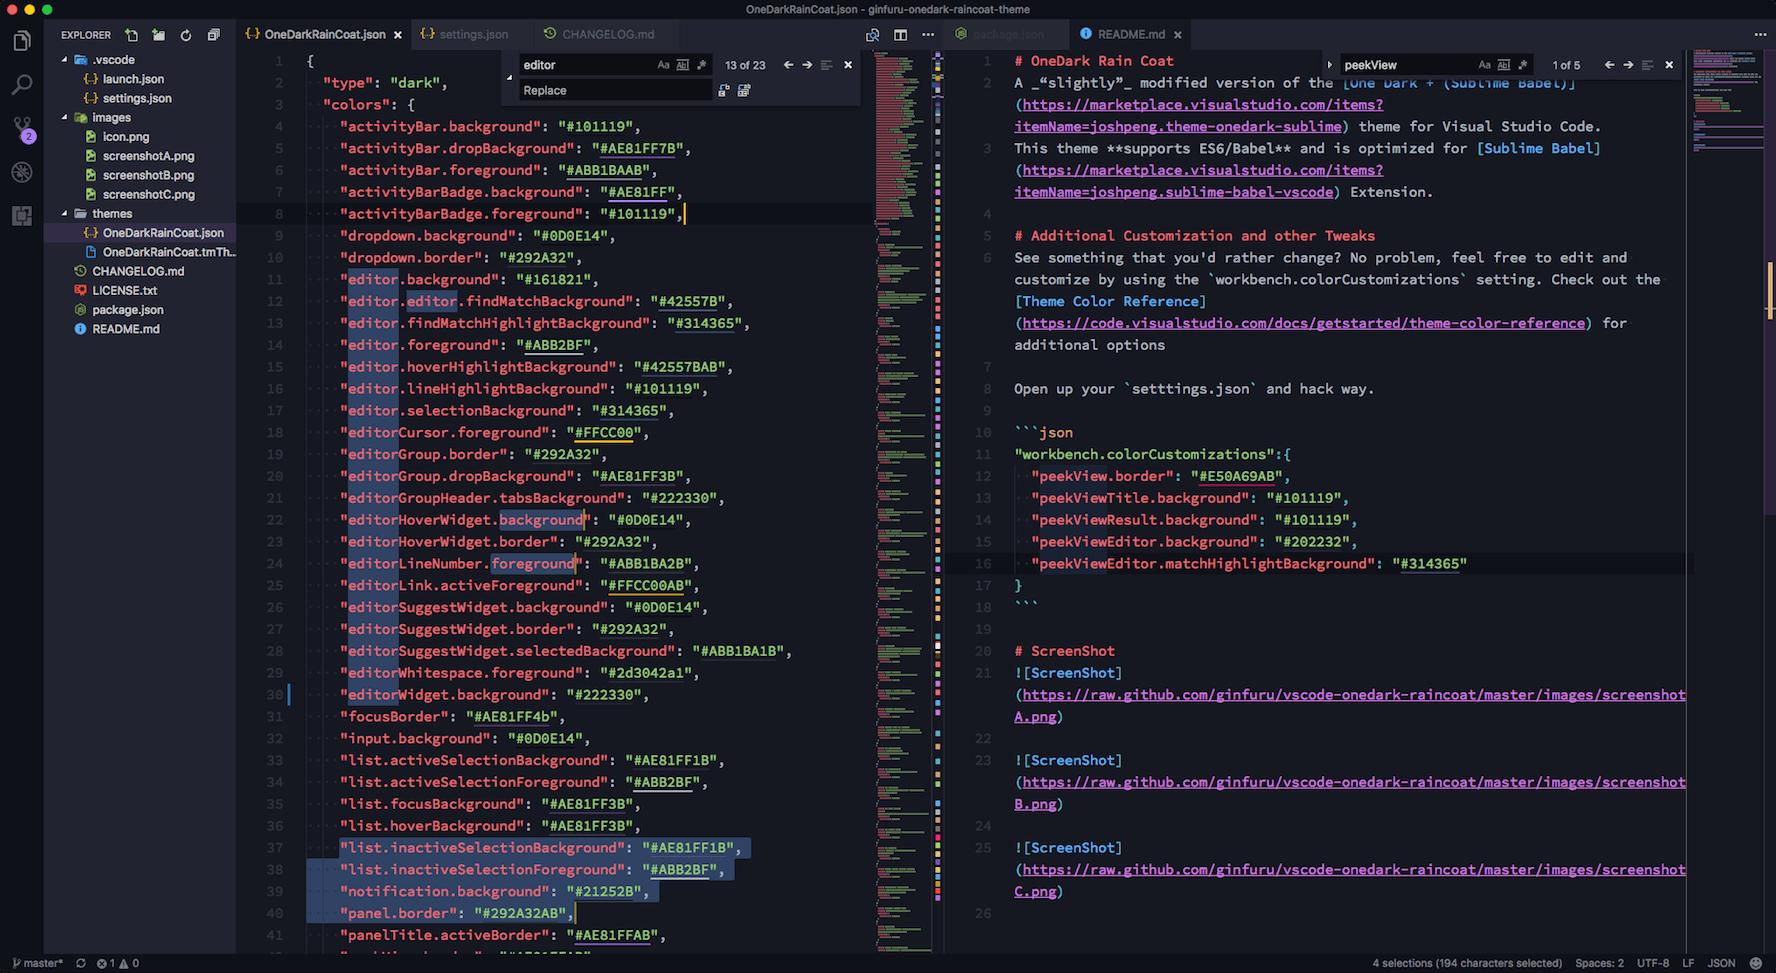 ScreenShot Workspace